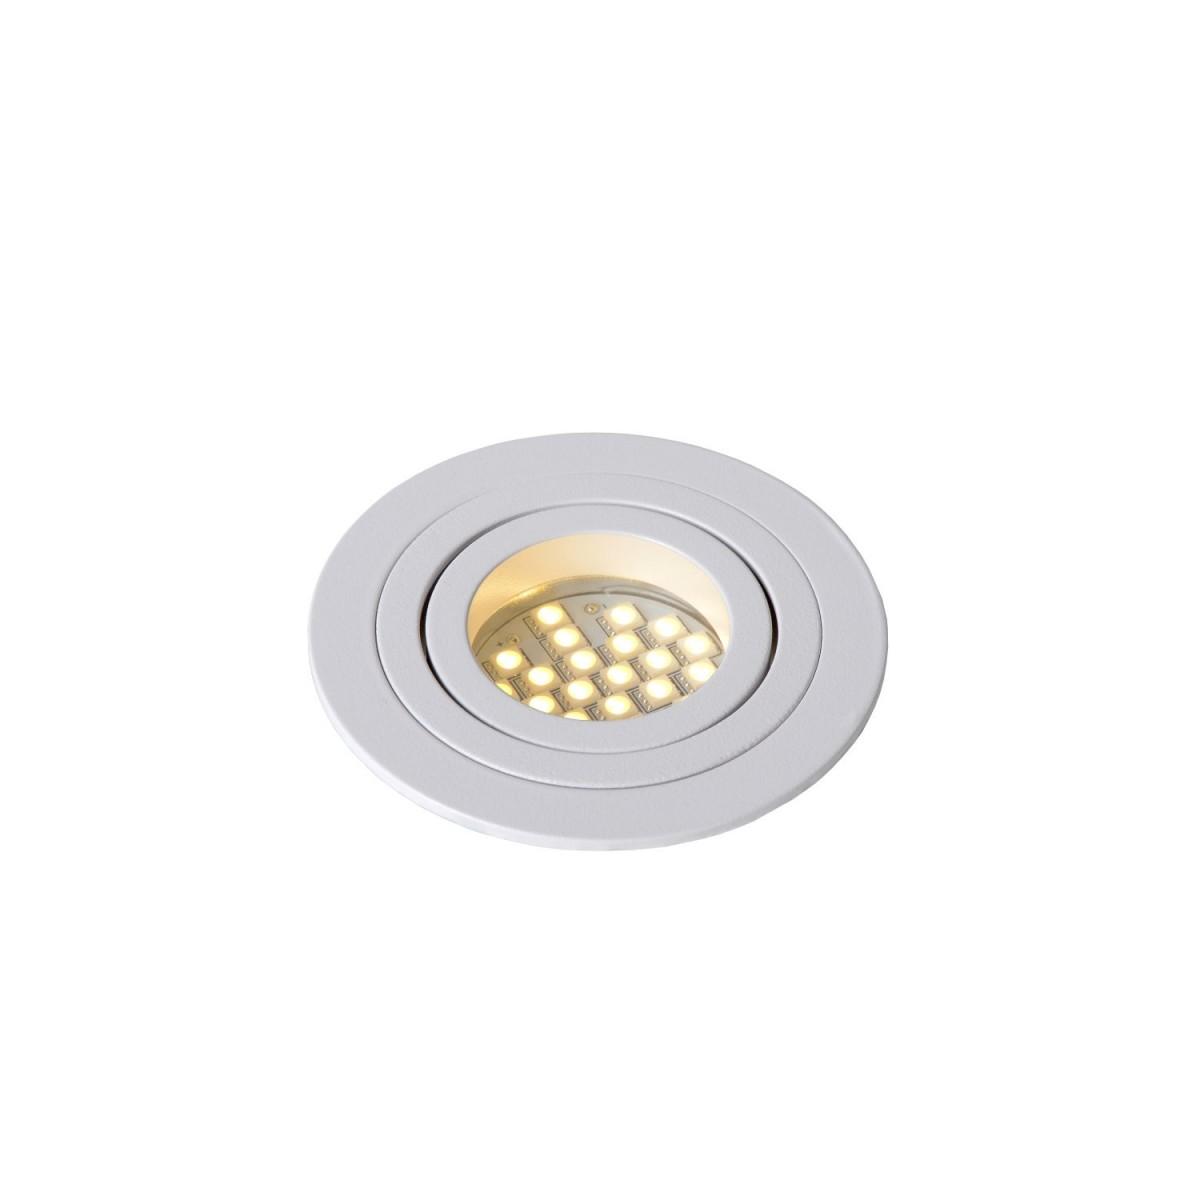 Lucide TUBE Spot Round D9cm GU10 Biały 22954/01/31 Wpust